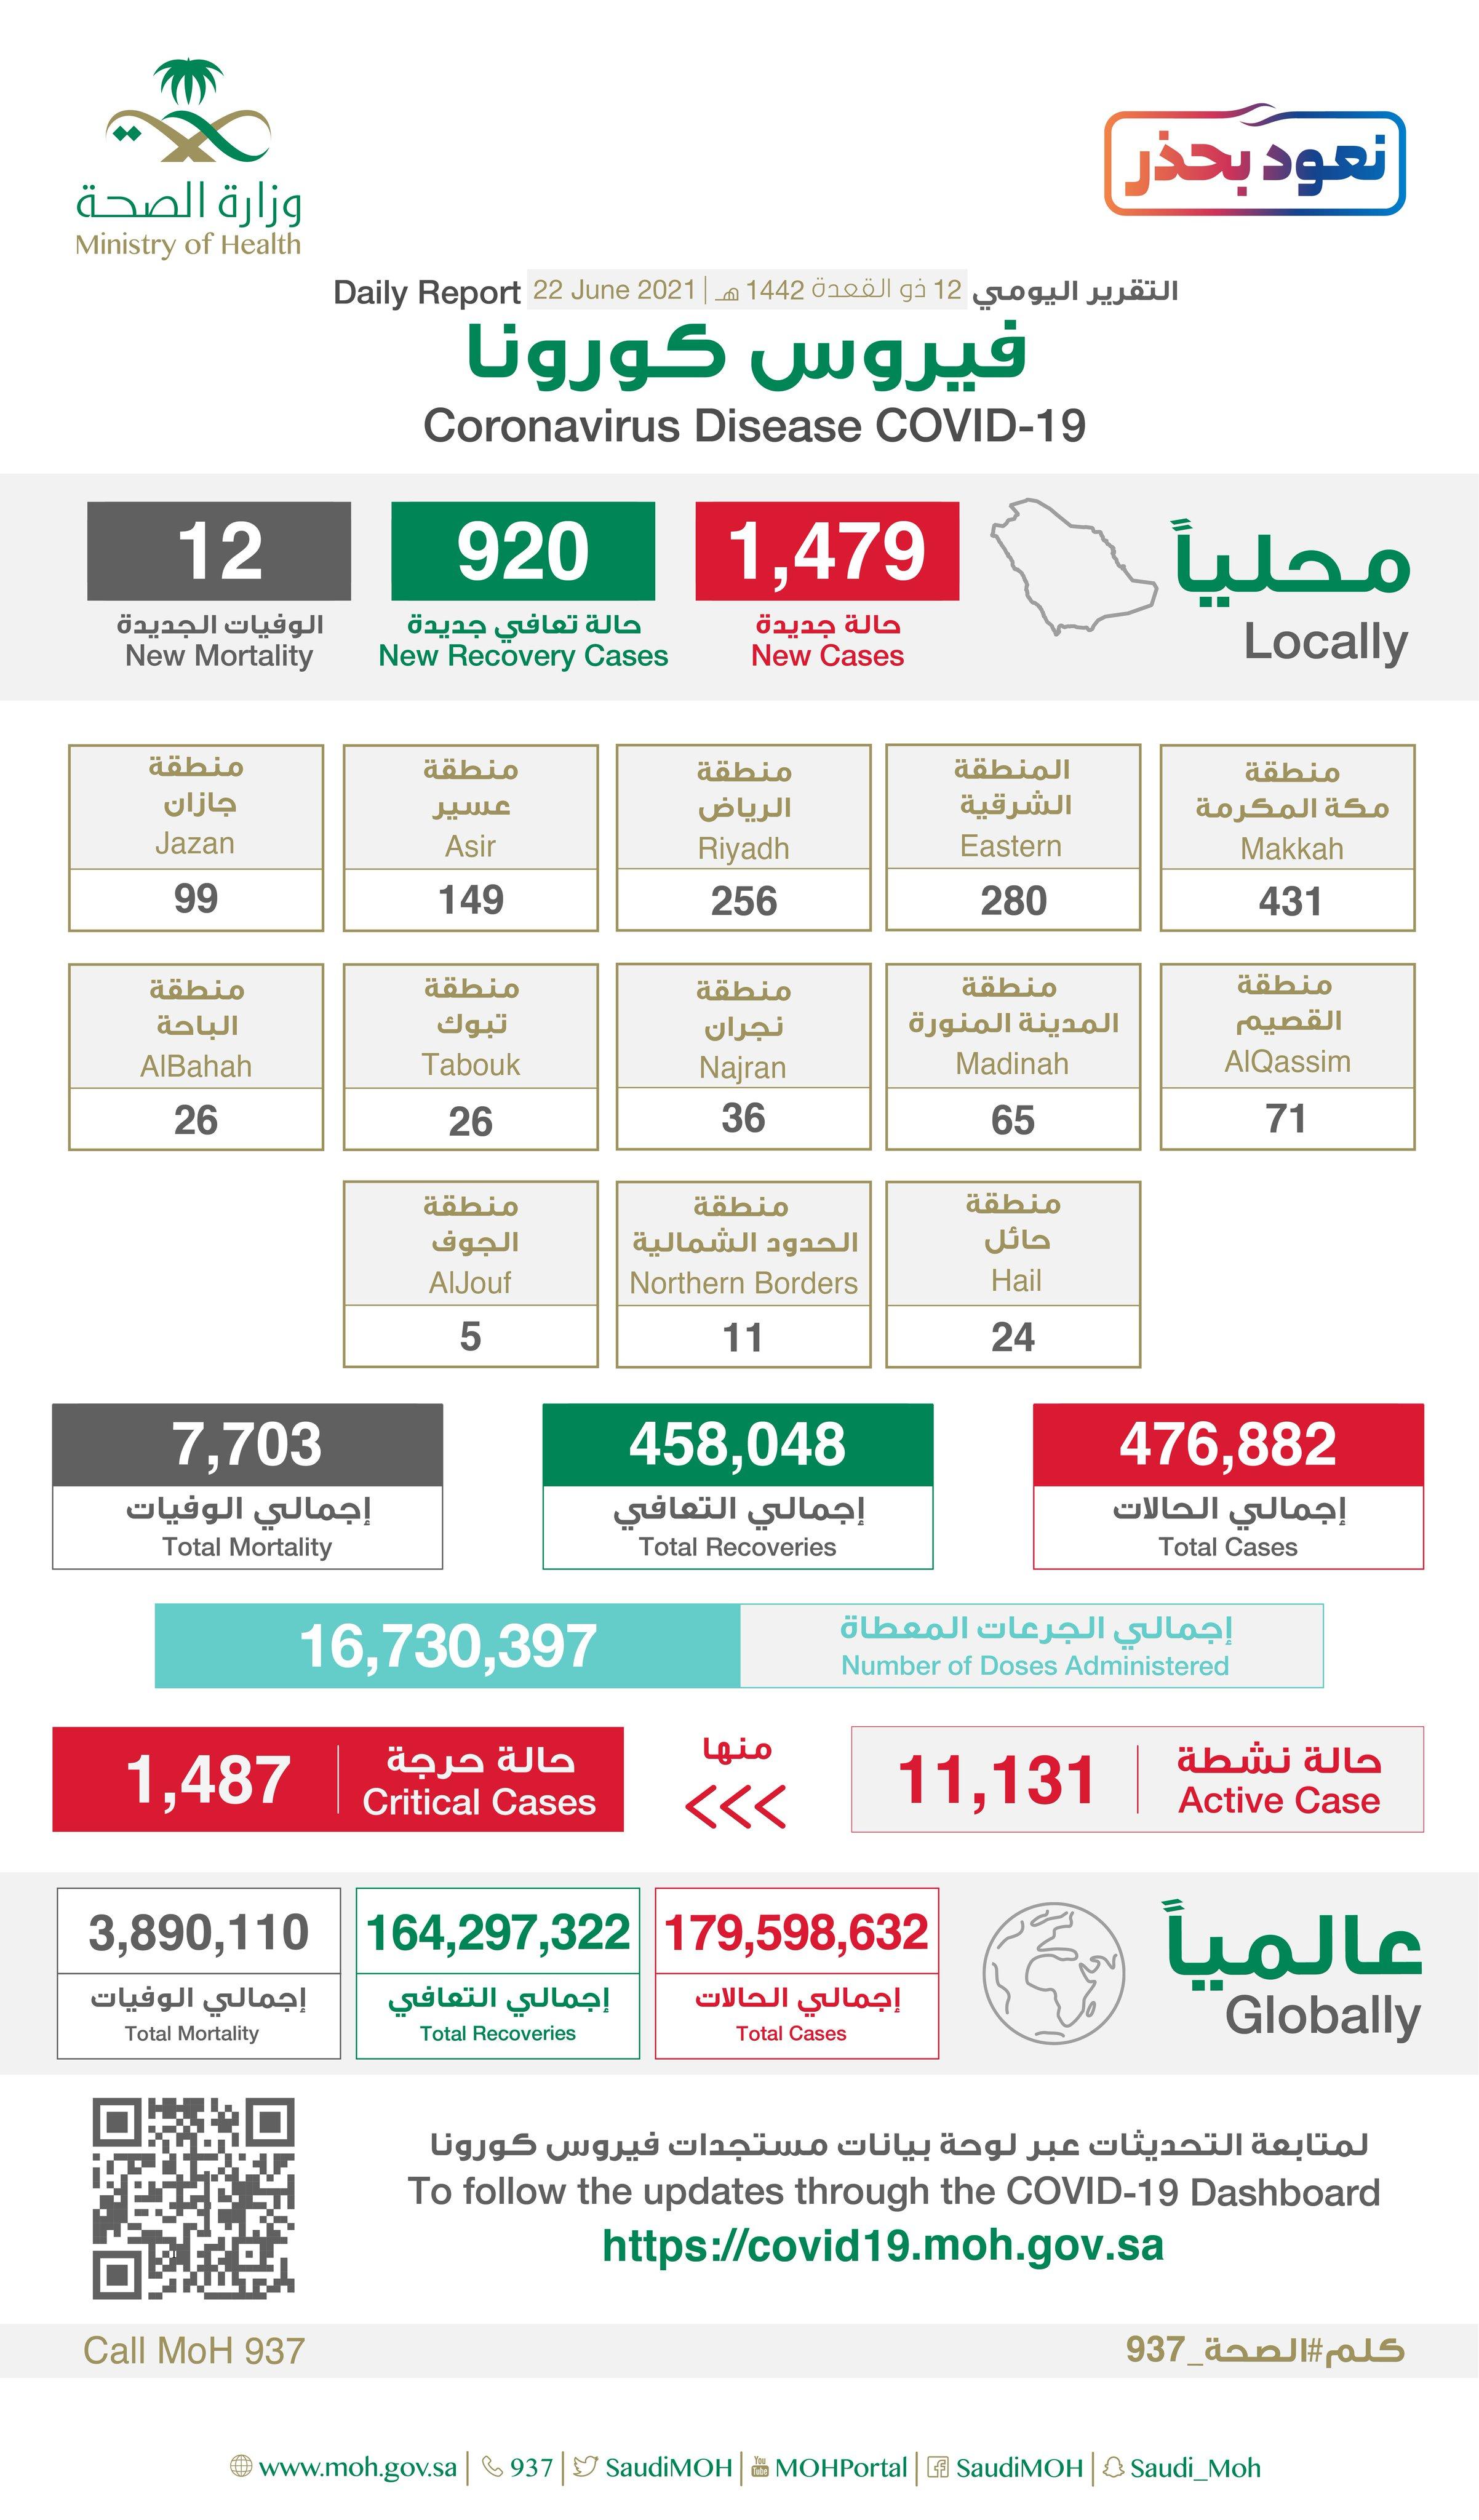 Saudi Arabia Coronavirus : Total Cases :476,882 , New Cases : 1,479 , Cured : 458,048 , Deaths: 7,703, Active Cases : 11,131